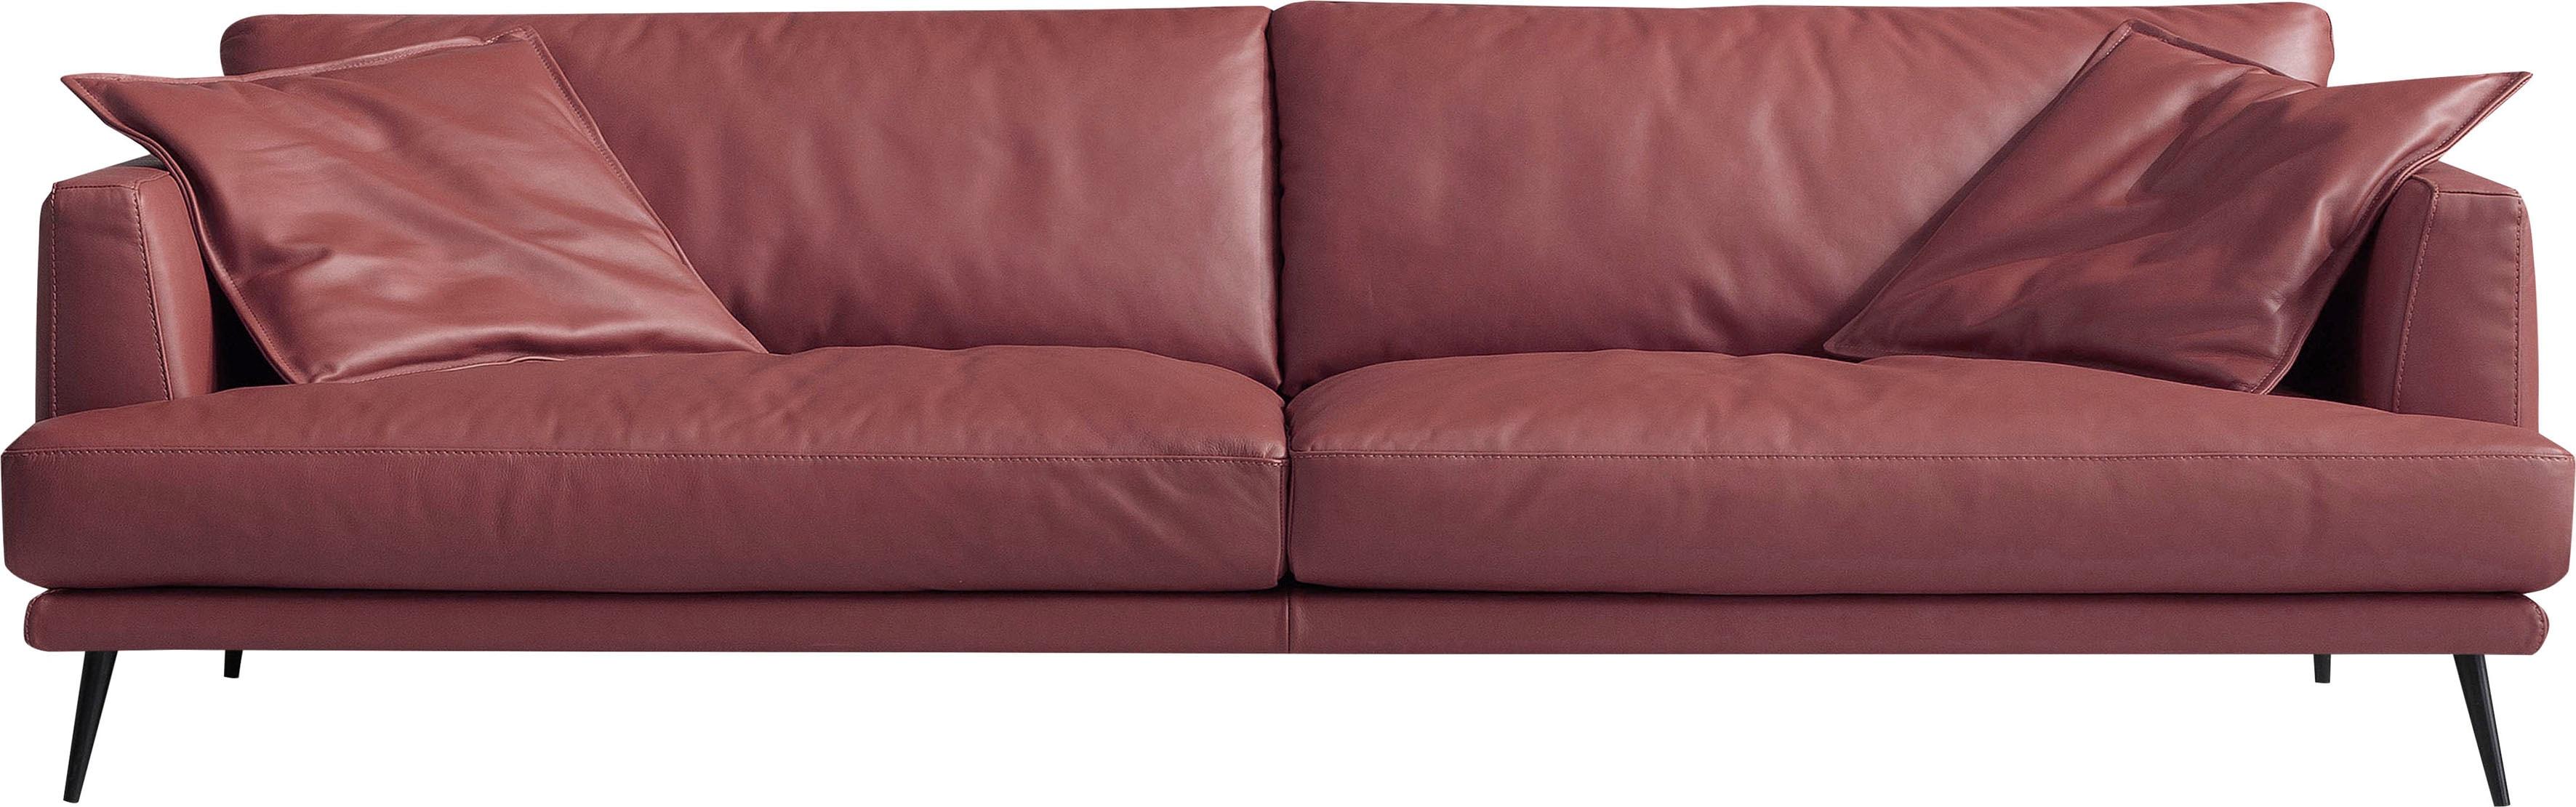 Egoitaliano 2,5-Sitzer Sophia, Daunenfederung, inkl. 2 Kissen günstig online kaufen